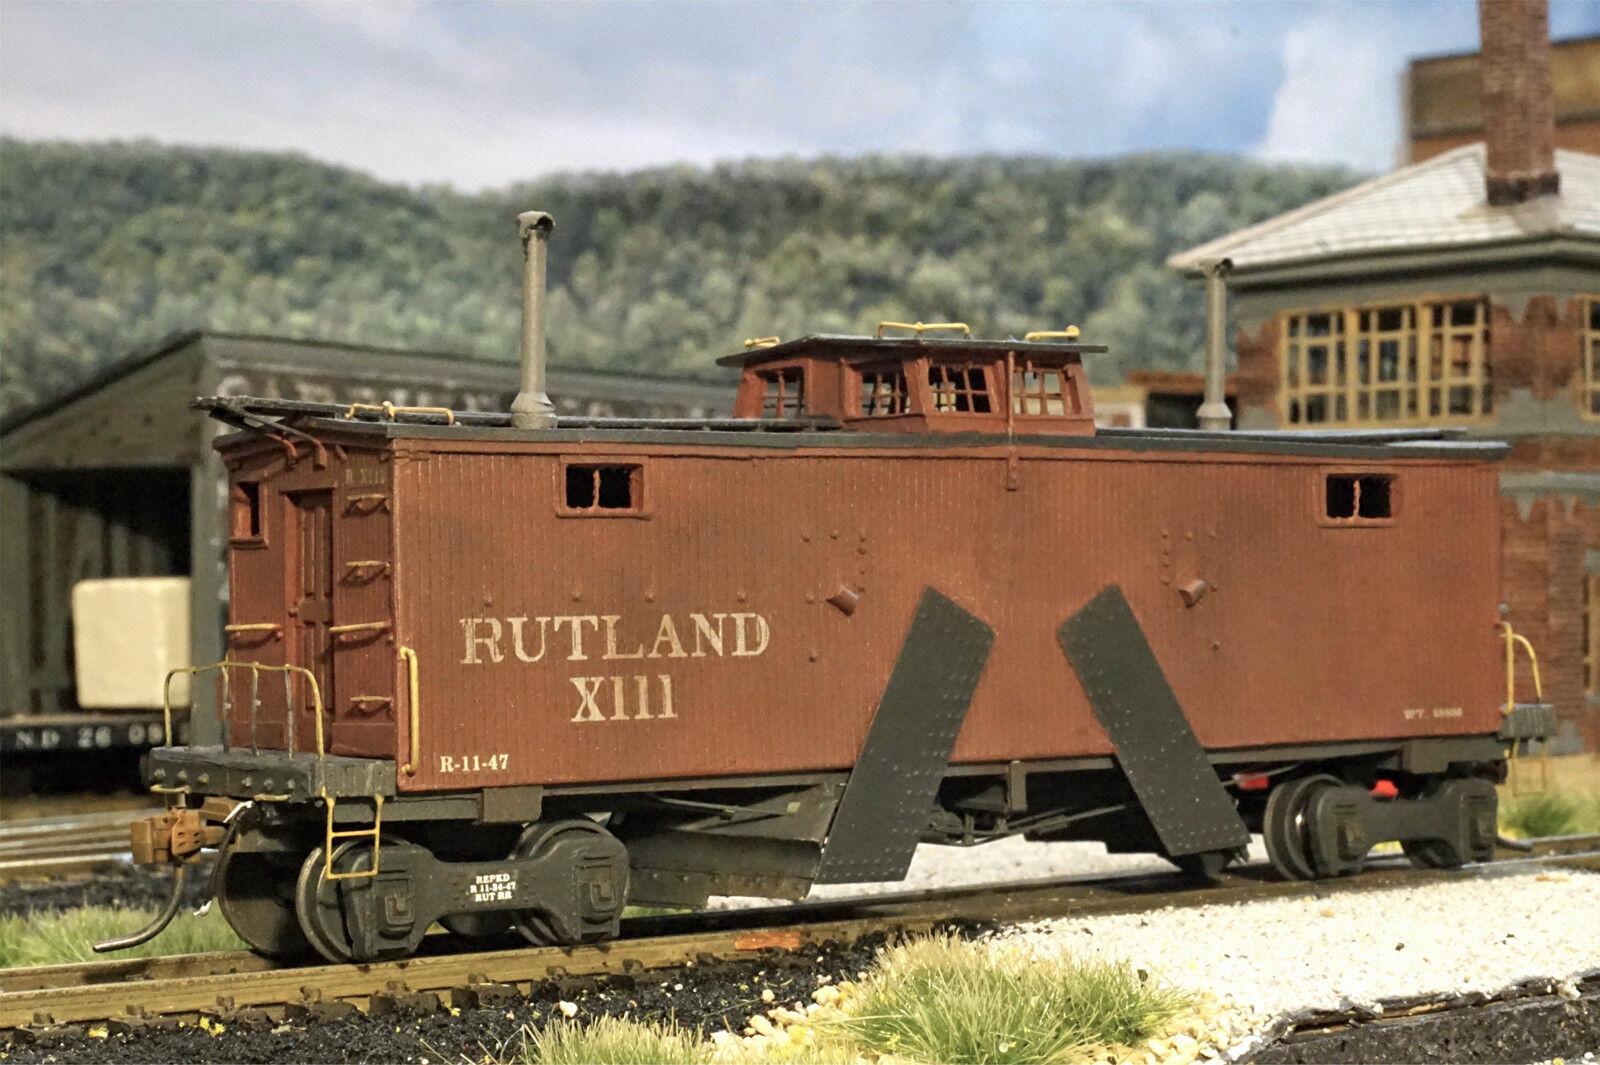 mejor calidad mejor precio Rutland Flanger  111 HO Modelo Modelo Modelo Del FerroCocheril cortar Sin Pintar Resina Kit SPK72  directo de fábrica